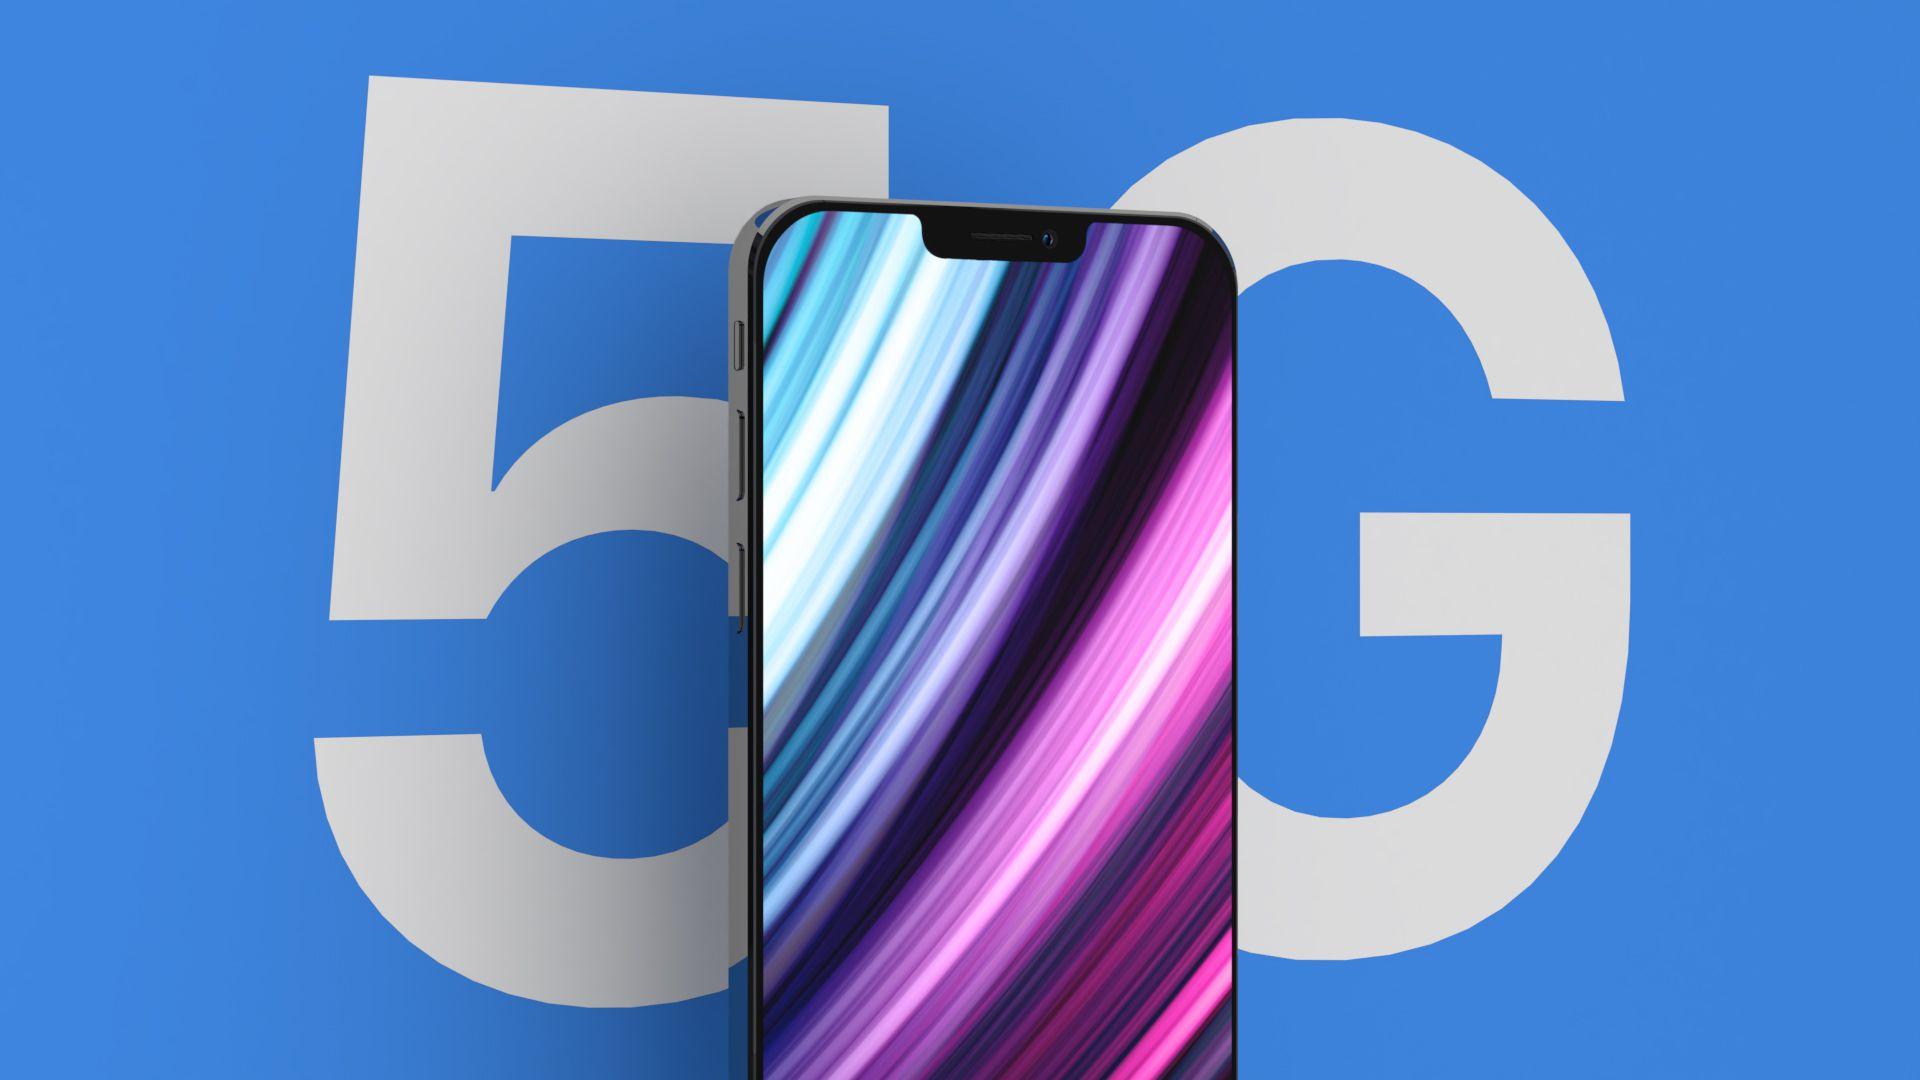 iPhone-12-5G-New-1.jpg